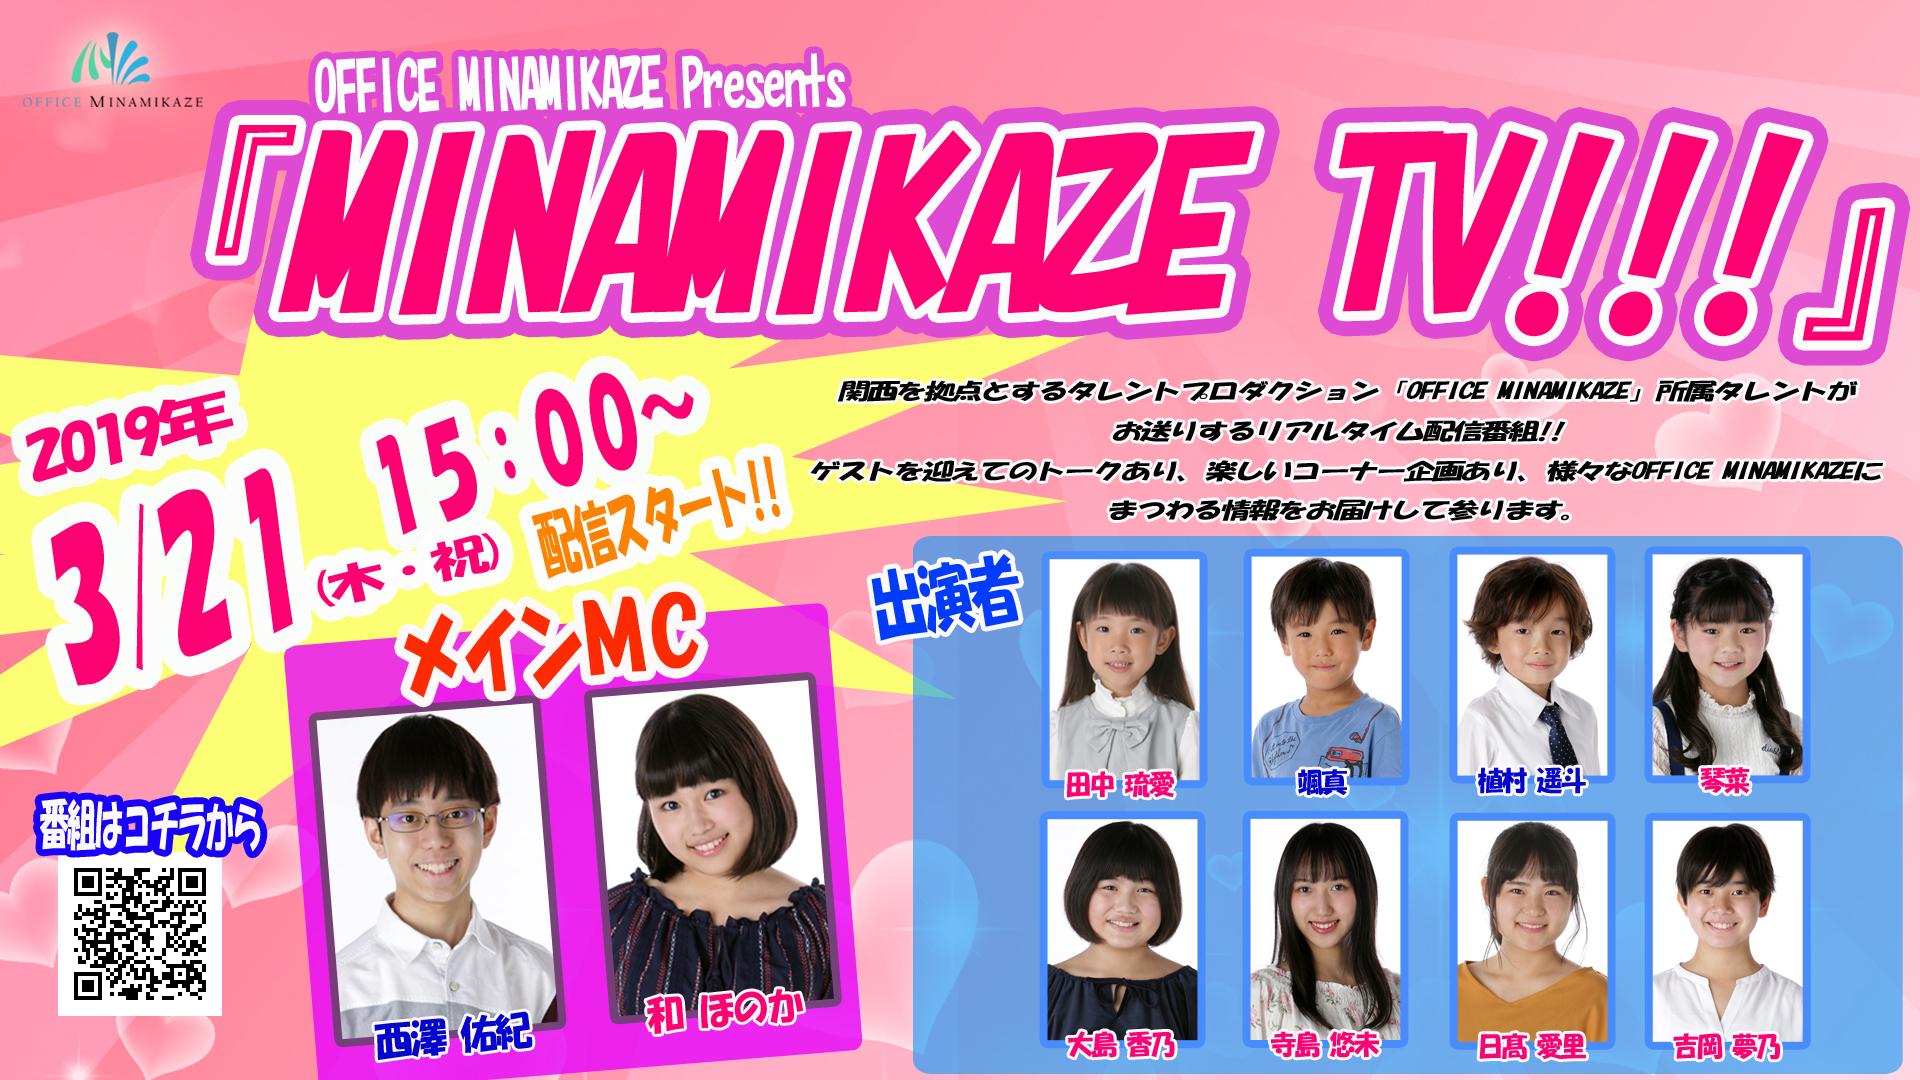 【出演情報】2019年3月21日(木・祝)OFFICE MINAMIKAZE Presents by FRESH!「MINAMIKAZE TV!!!」